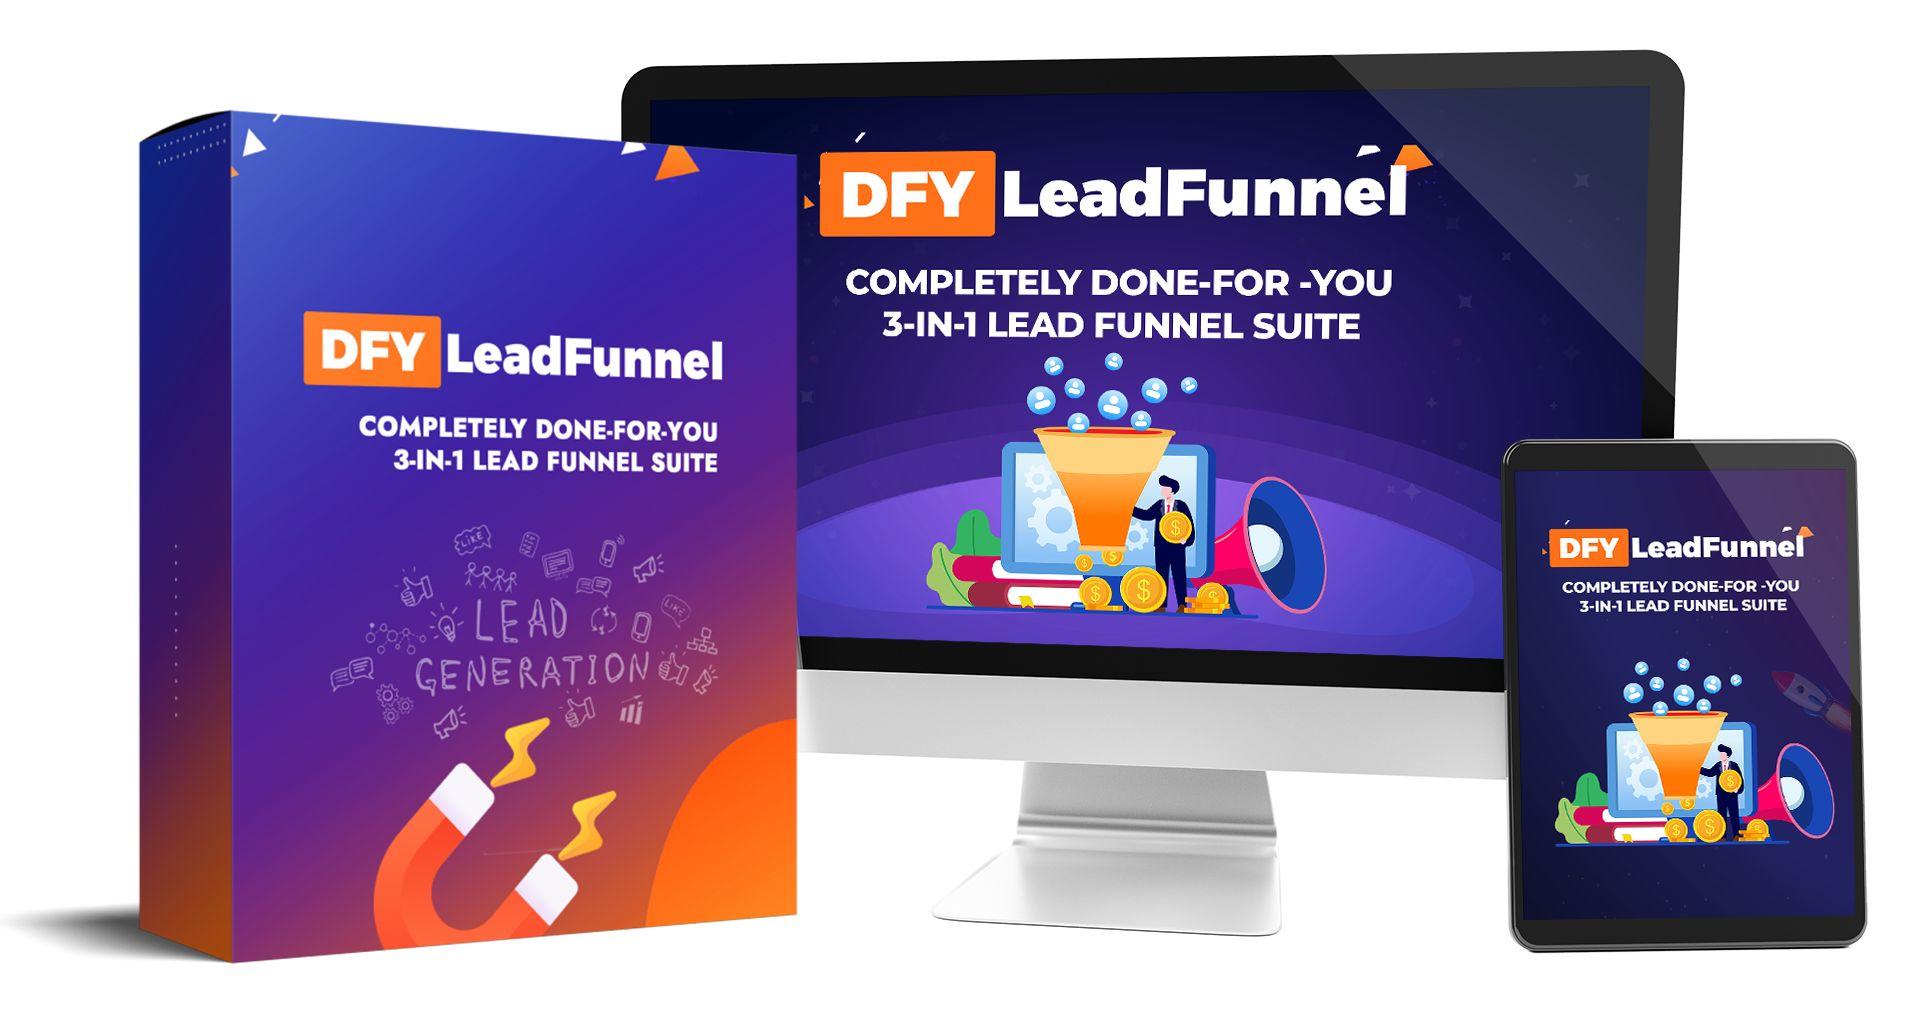 DFY-LeadFunnels-Review